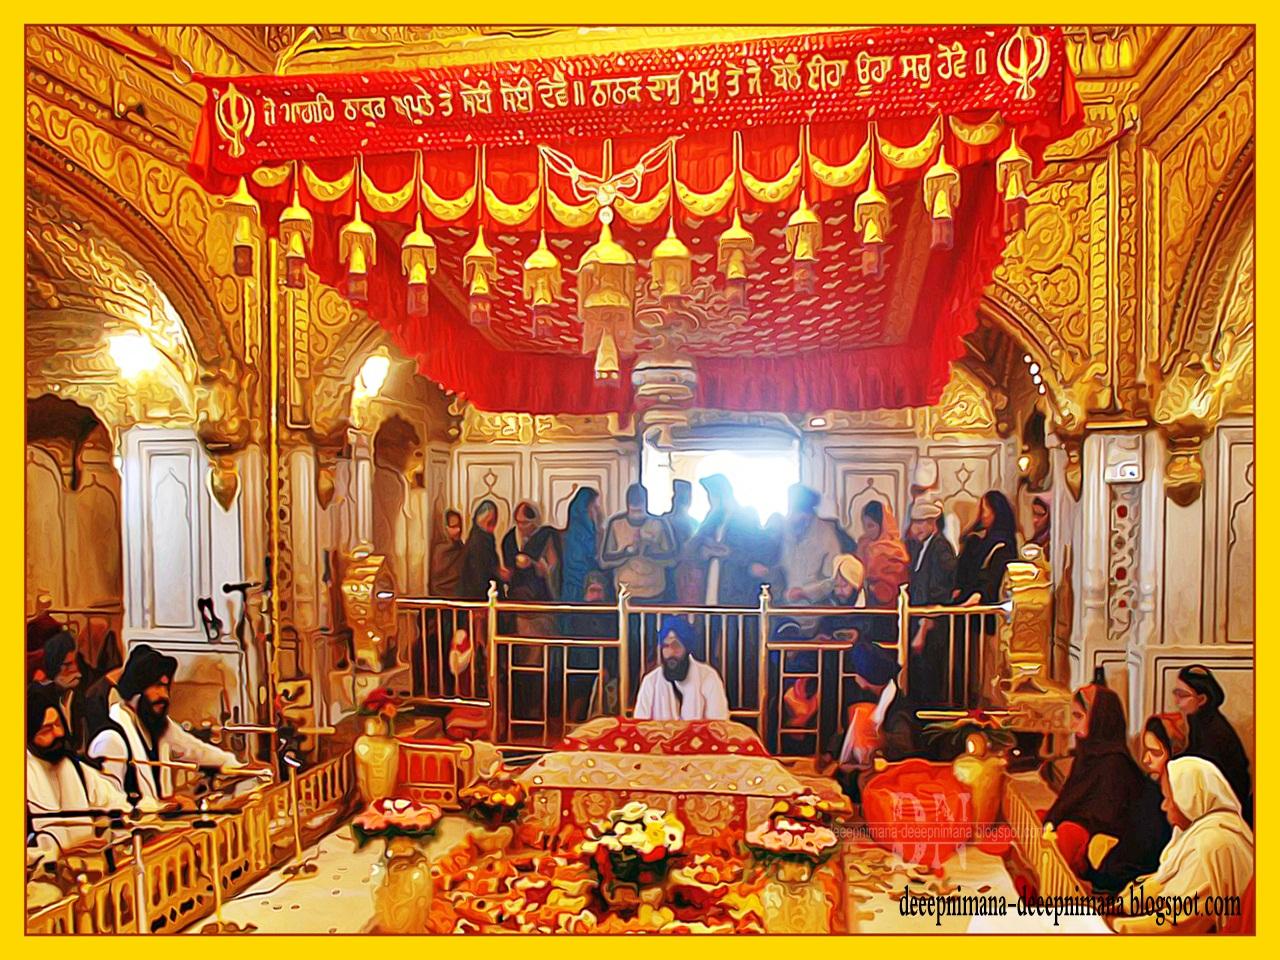 Ek Onkar Hd Wallpaper Deeepnimana Deeepnimana Blogspot Com Guru Granth Sahib Ji